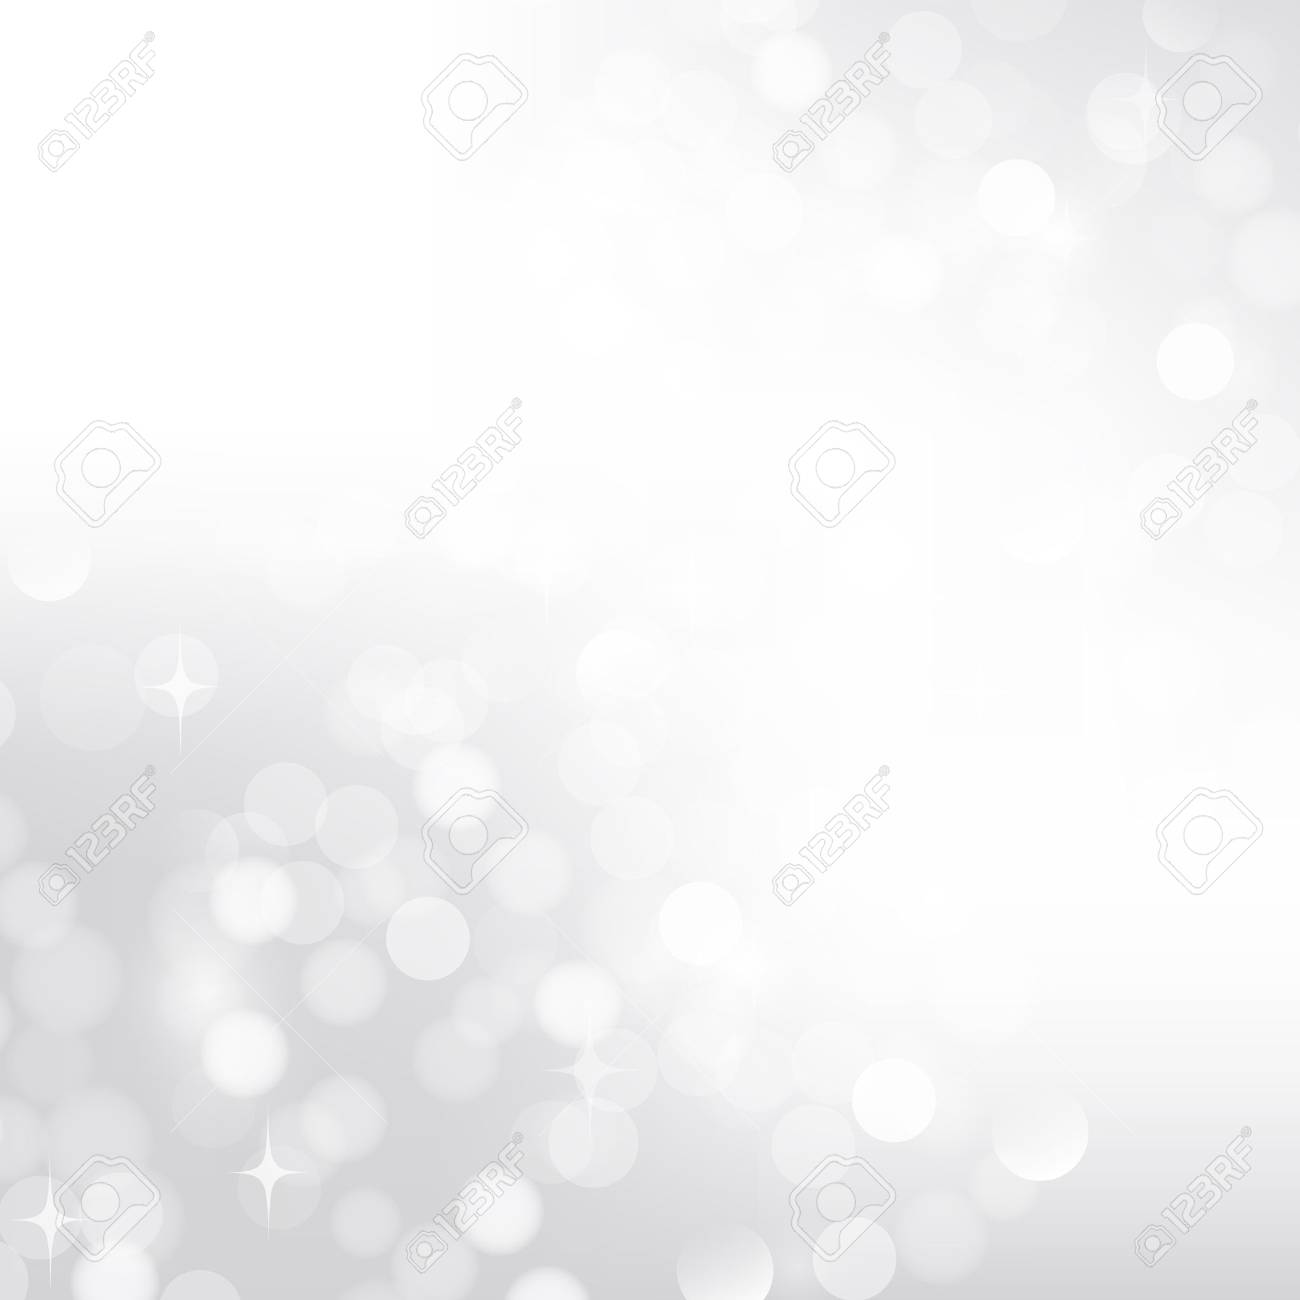 Silver bokeh background lights for postcard - 27449500